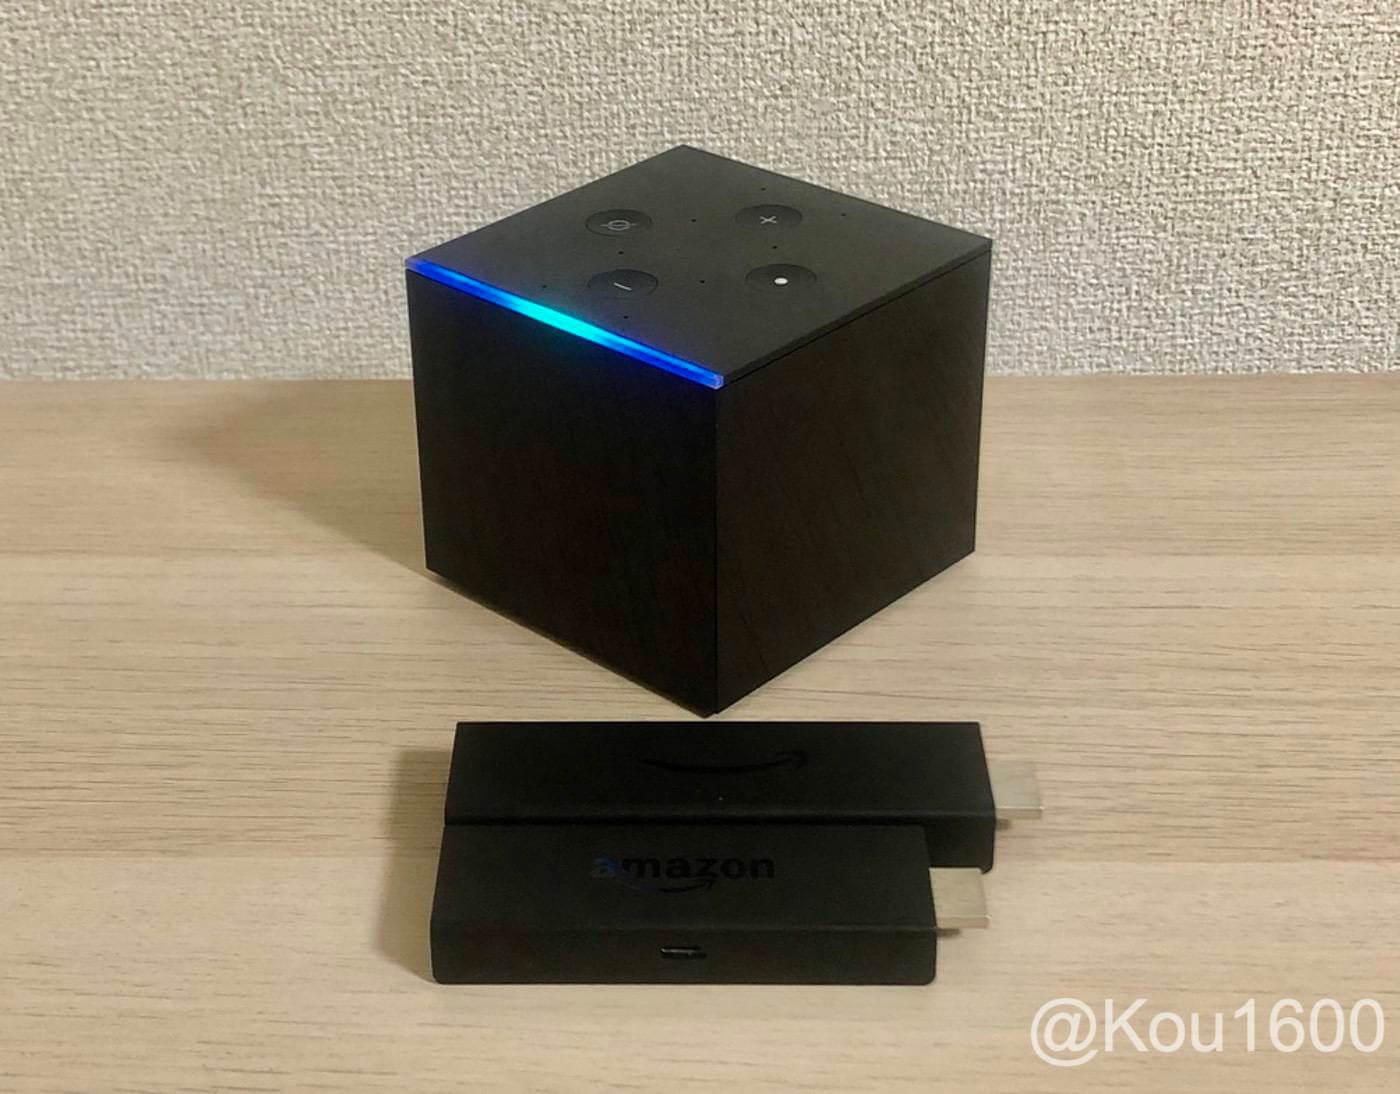 Fire TV Cubeのアレクサ